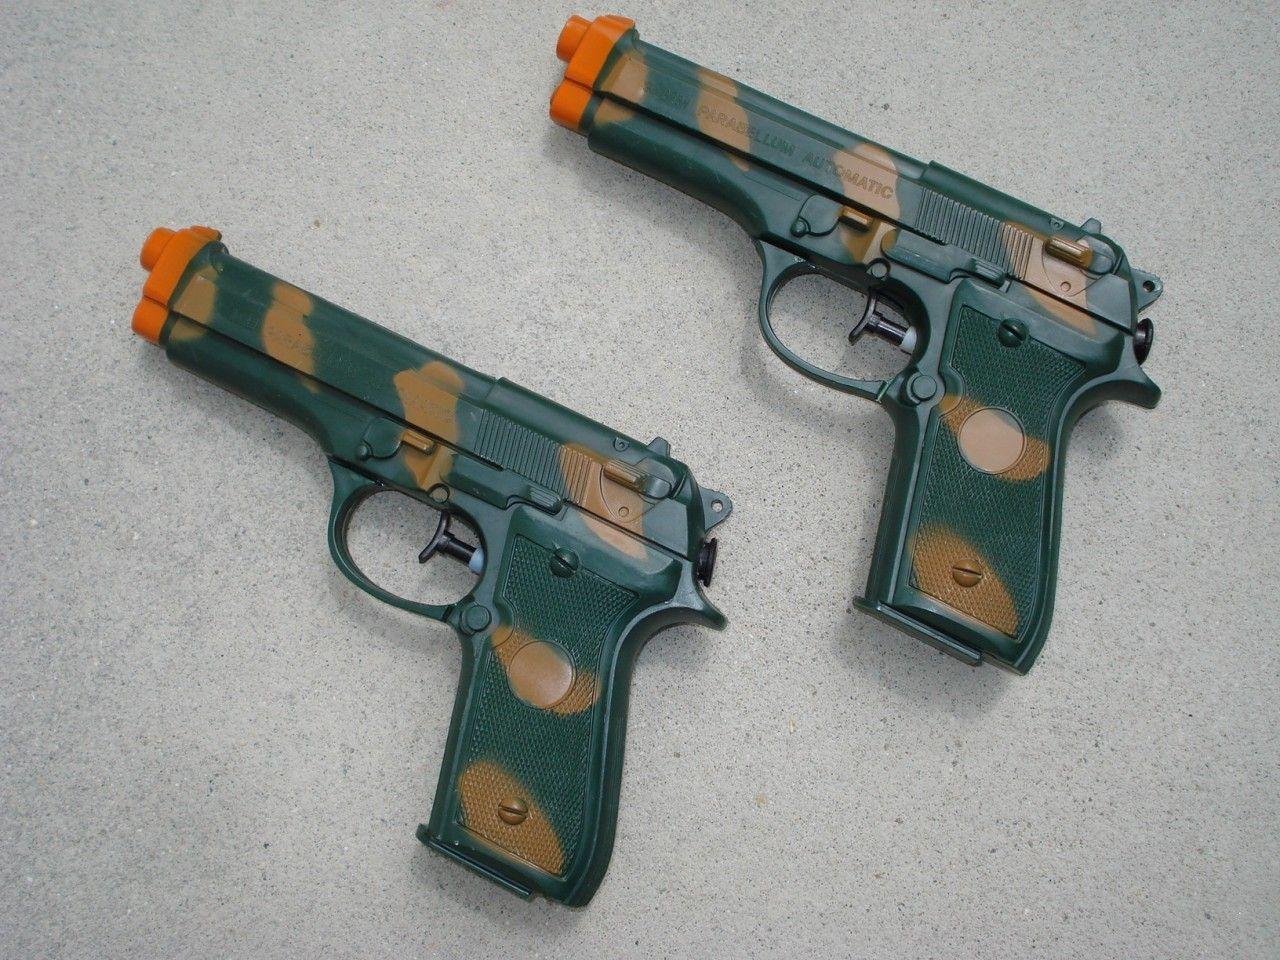 realistic squirt guns big dick rappers